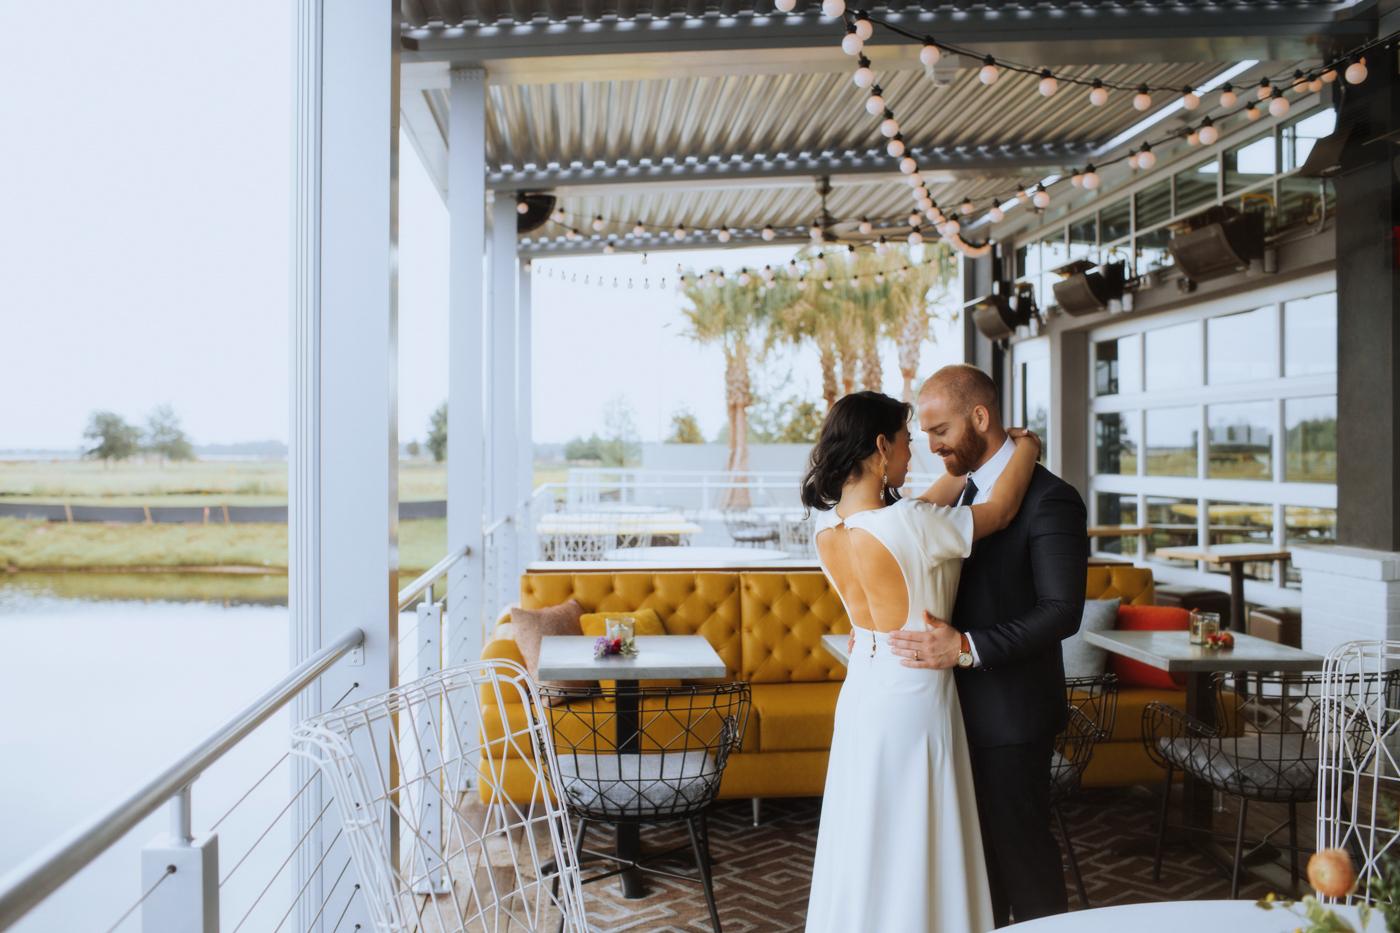 Wedding | Canvas Market | Lake Nona-Orlando, FL  | Vanessa Boy Photography | vanessaboy.com-209.com |Green Wedding Shoes.jpg